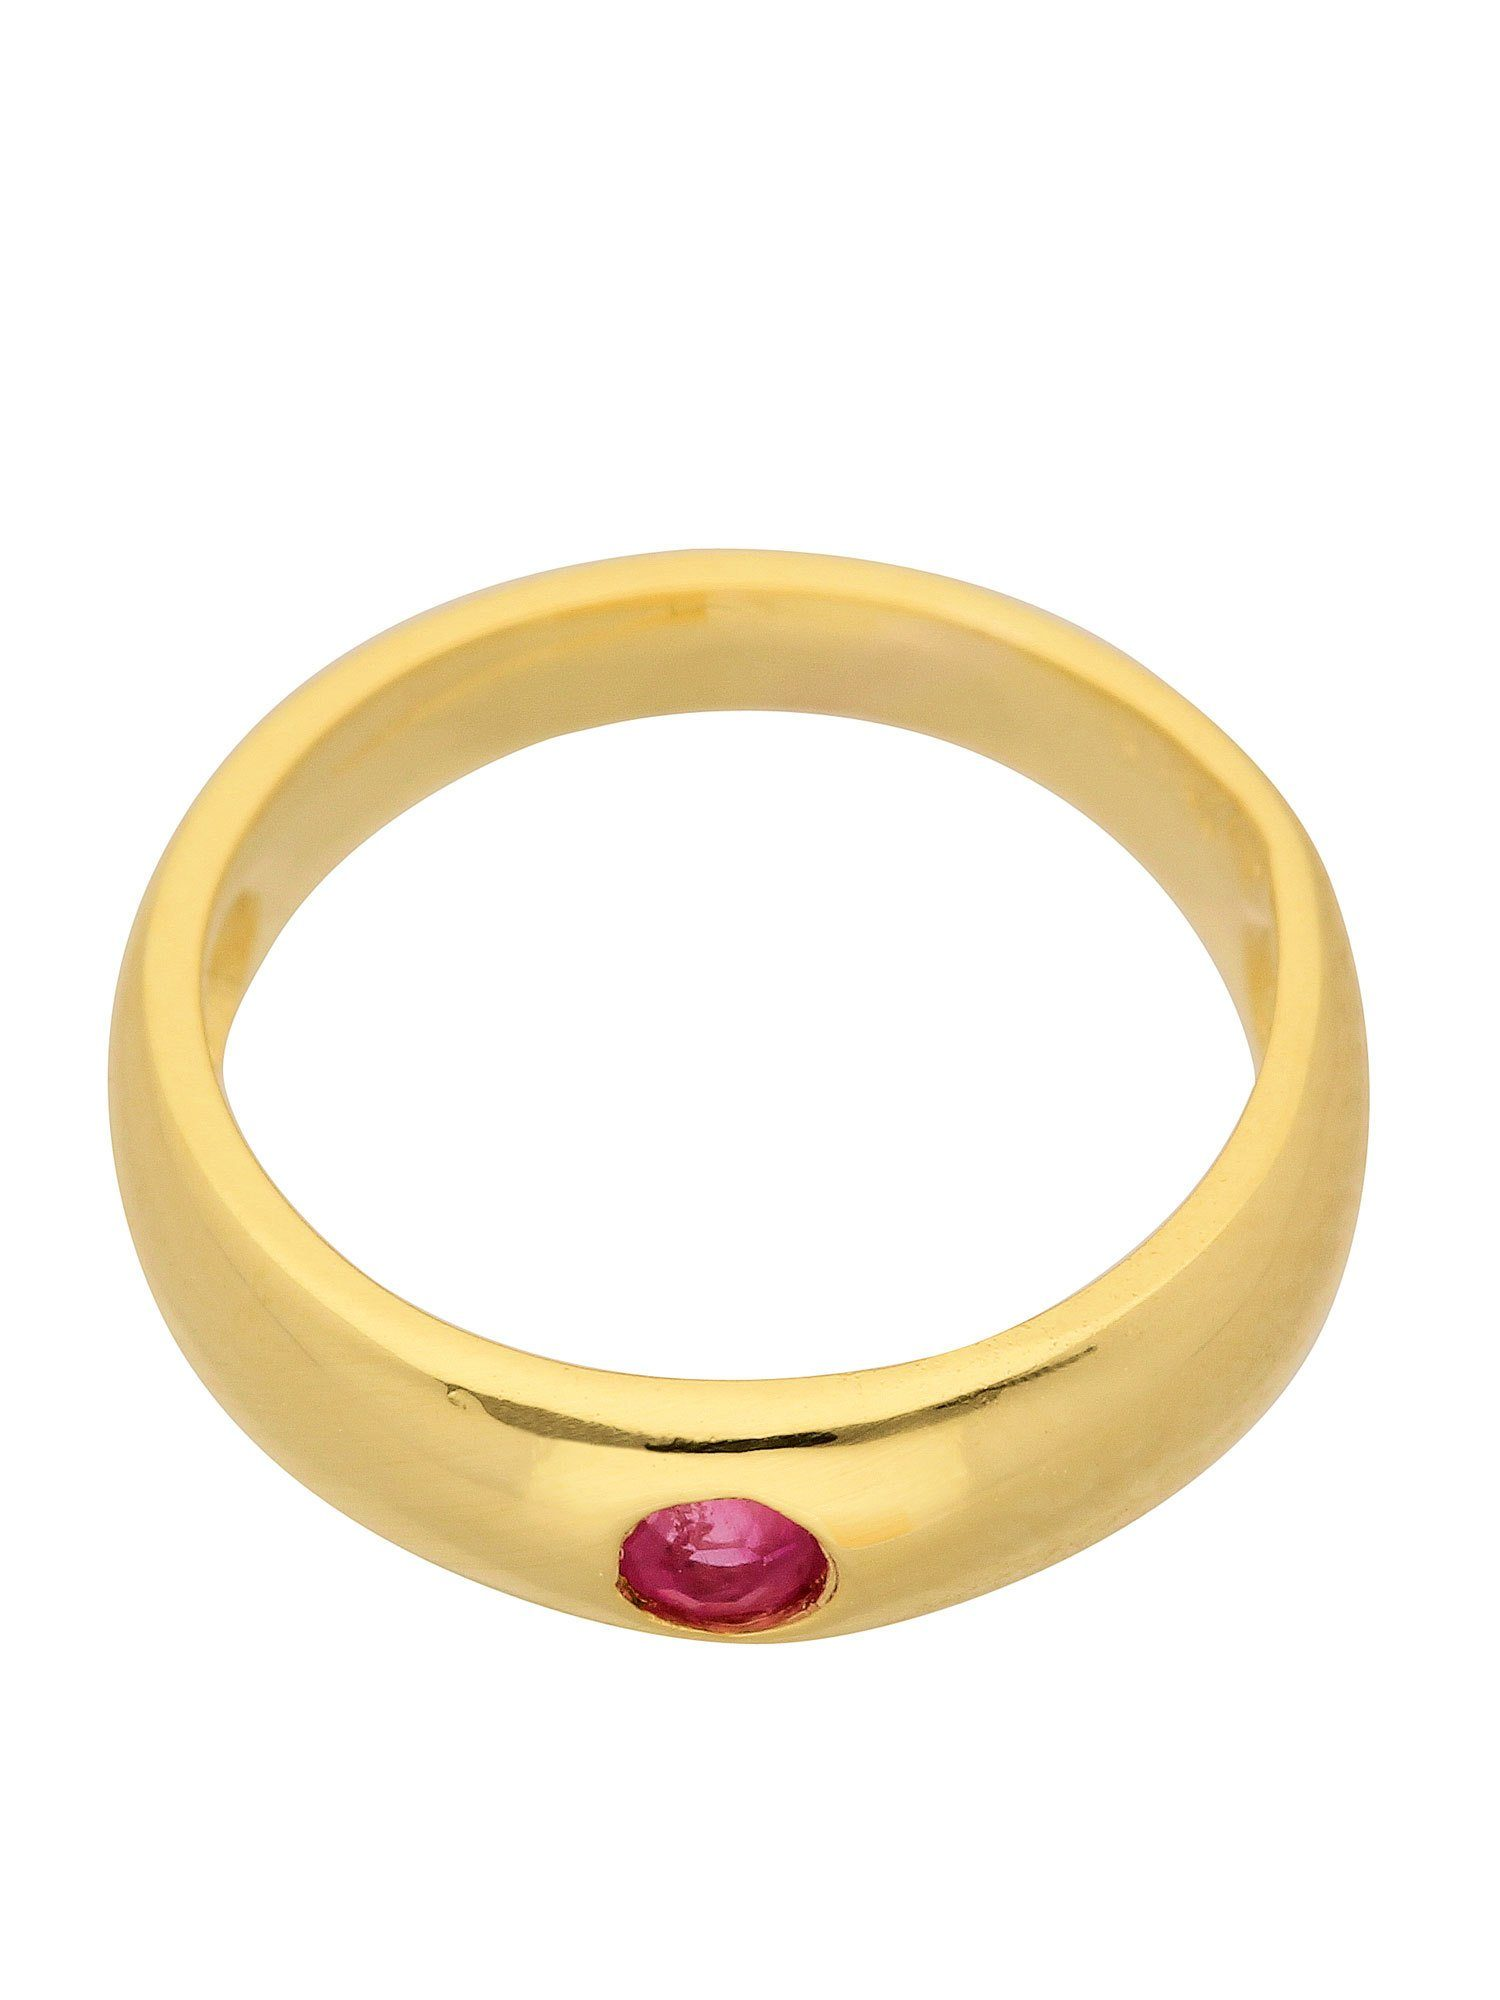 Adelia´s Kettenanhänger »Gold 14 k (585) Motiv - Anhänger« Taufring 14 k 585 Gelbgold mit Rubin Ø 1.12 cm